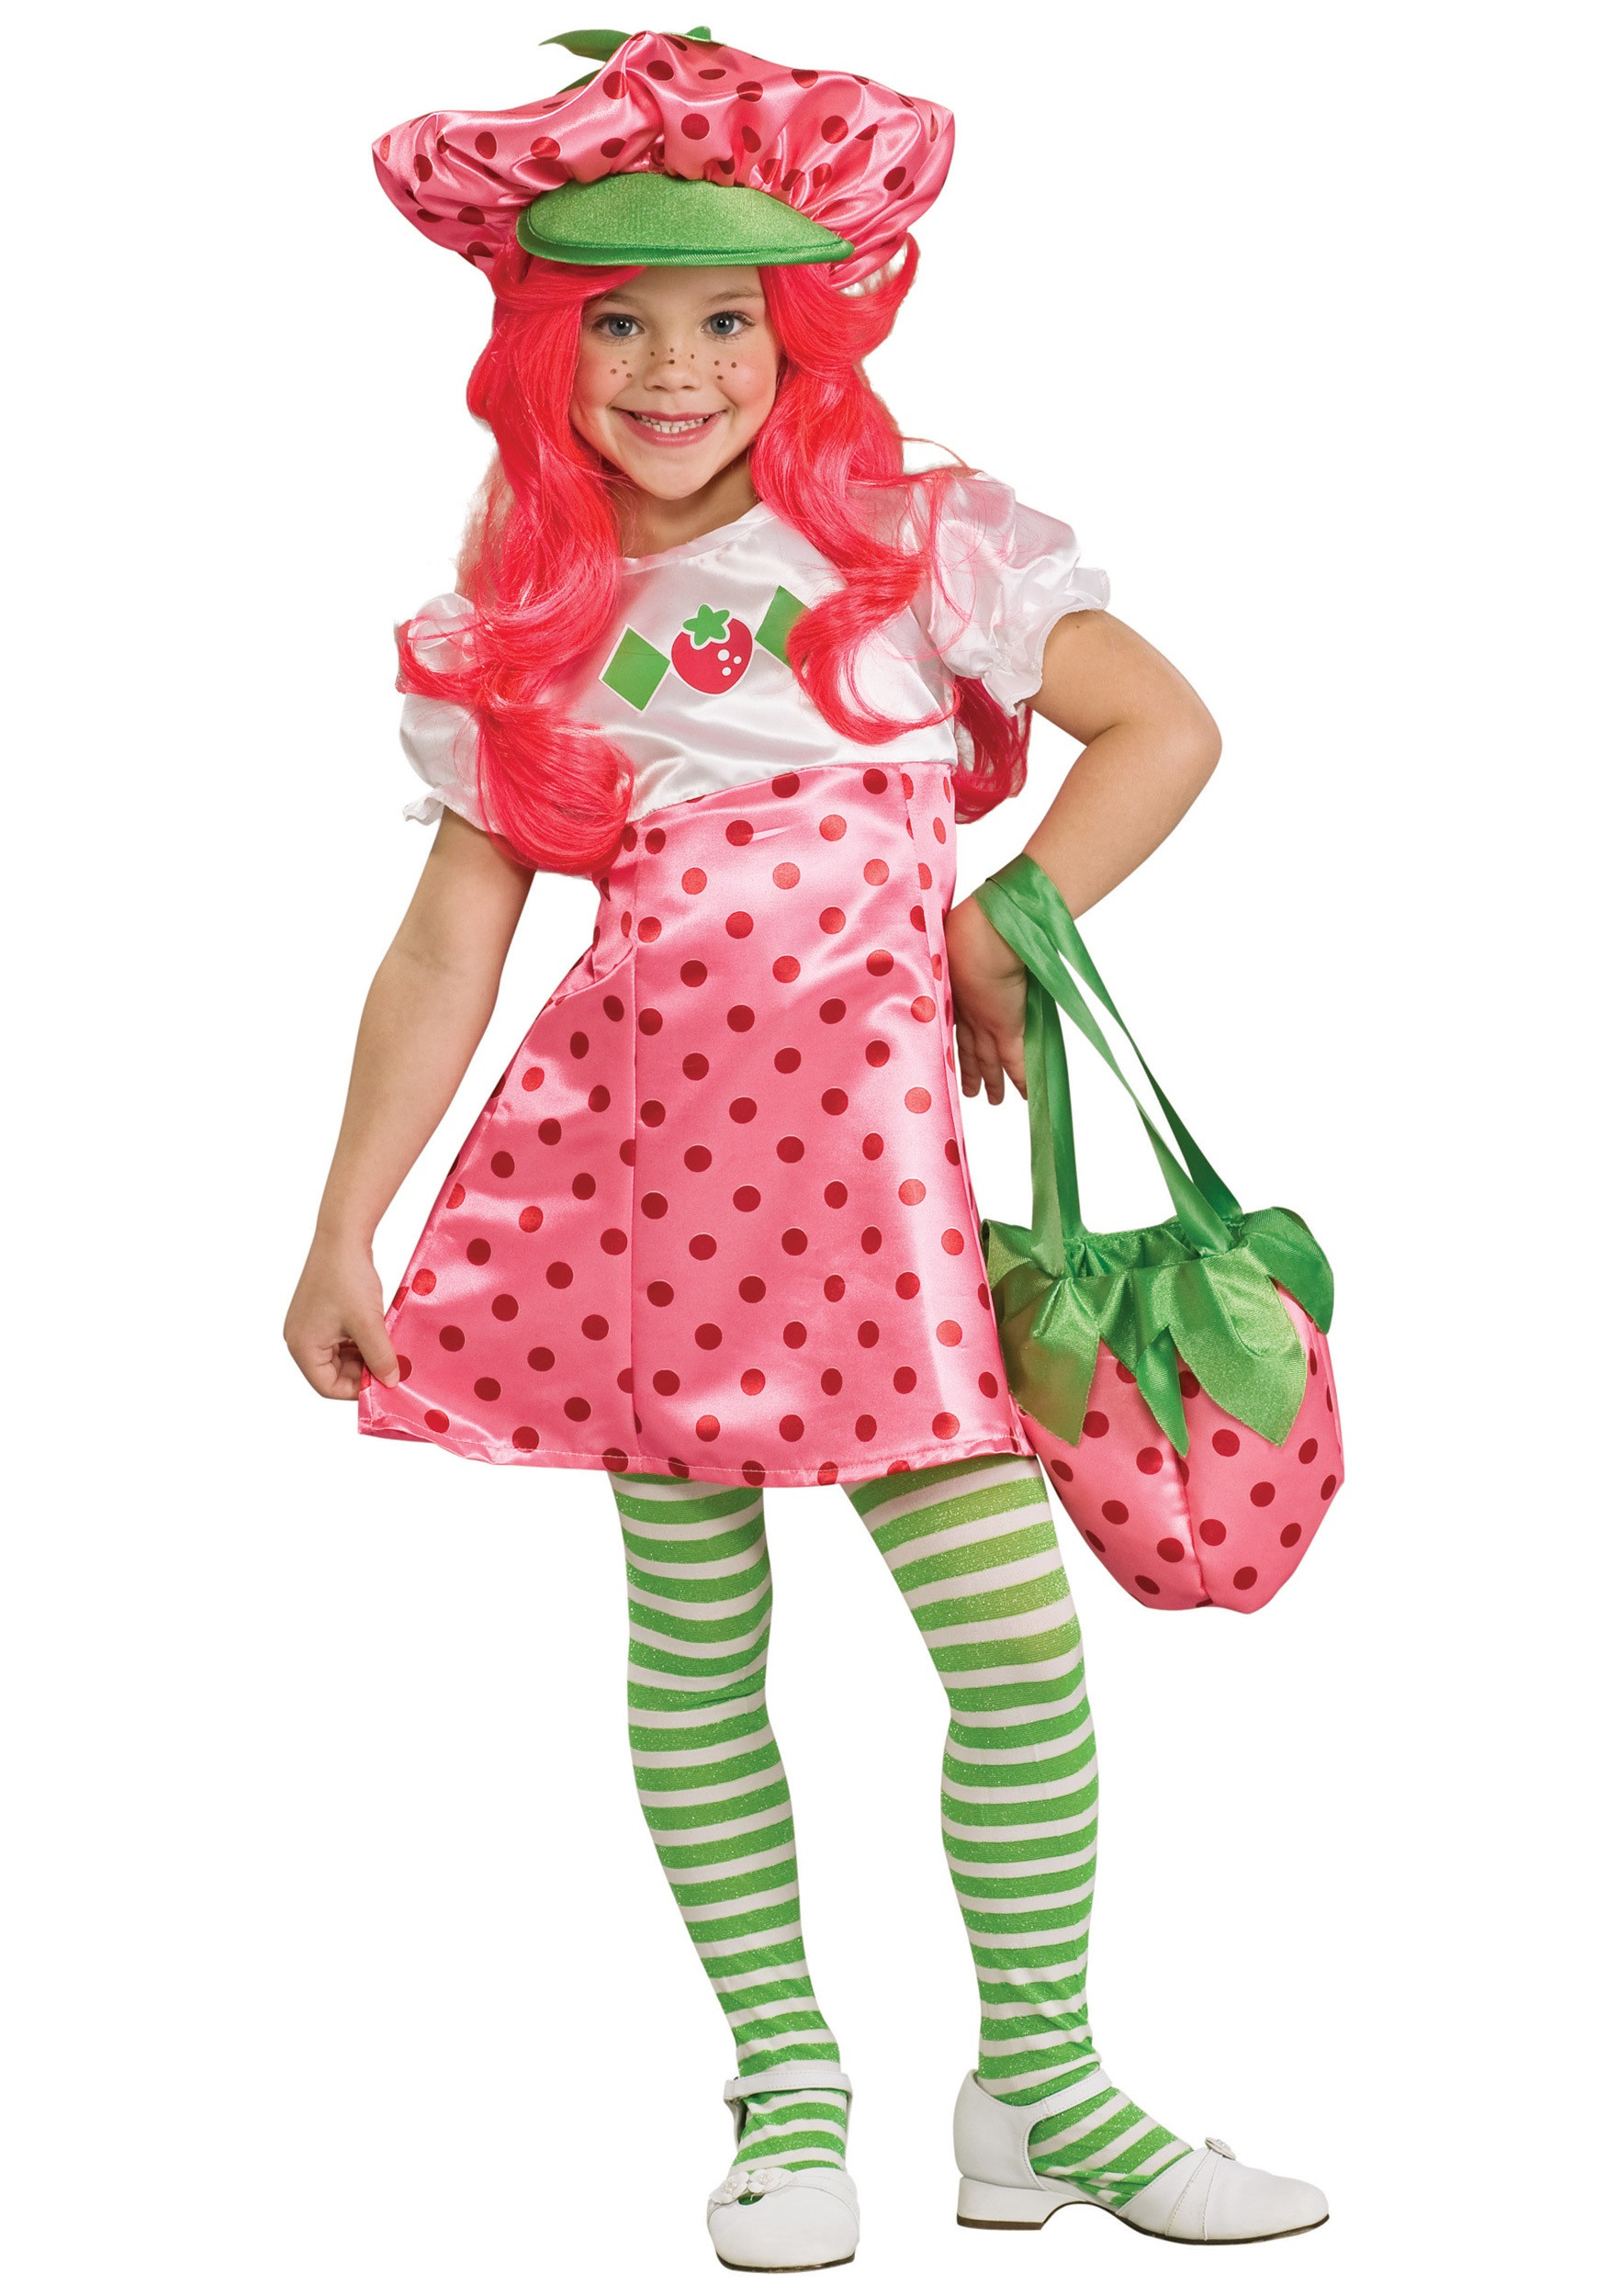 Strawberry Shortcake Haloween Costume  Child Strawberry Shortcake Costume